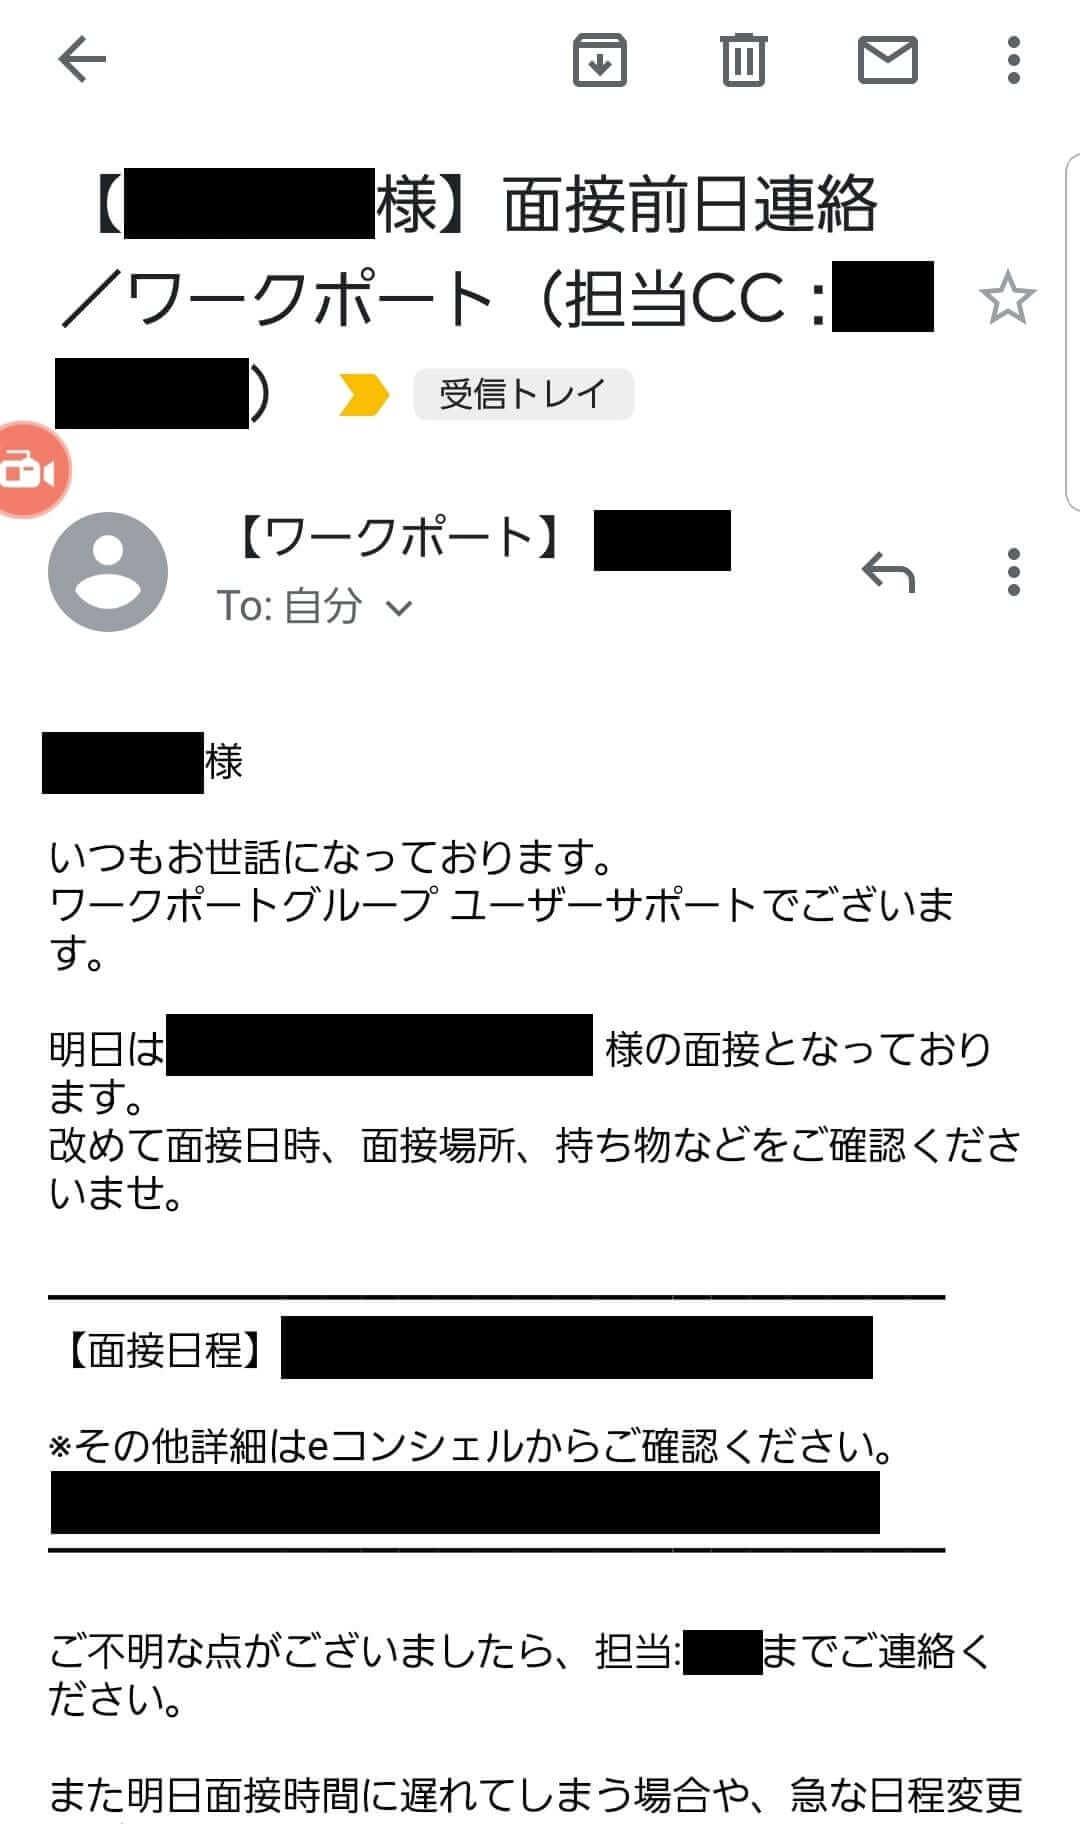 WORKPORT仙台オフィス